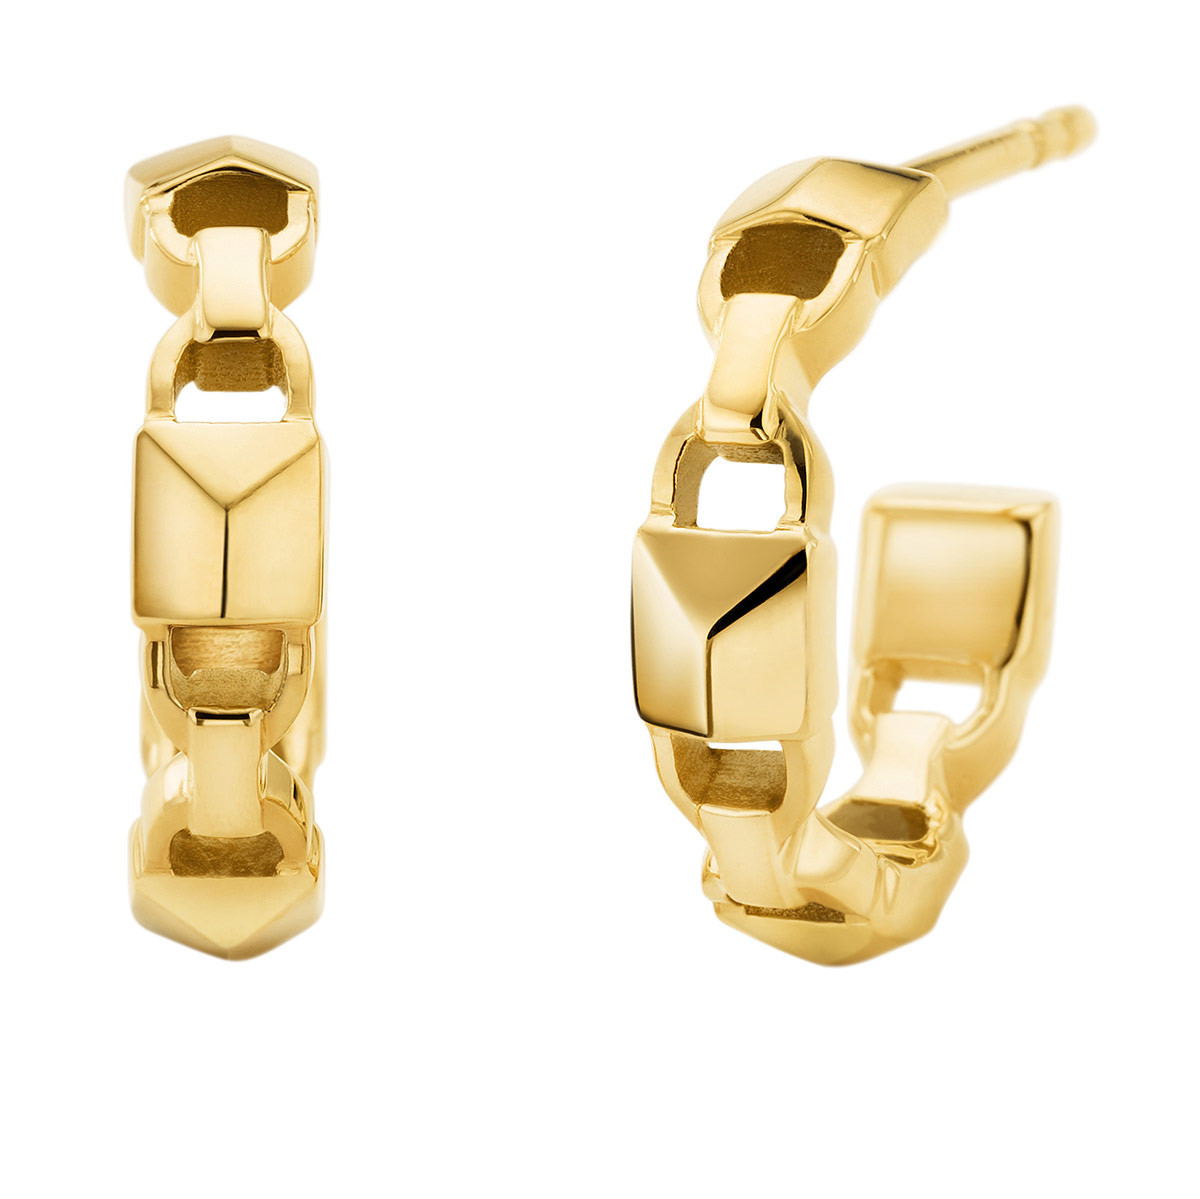 Michael Kors Ohrringe - MKC1013AA710 Huggie Mercer Link Gold - in gold - für Damen